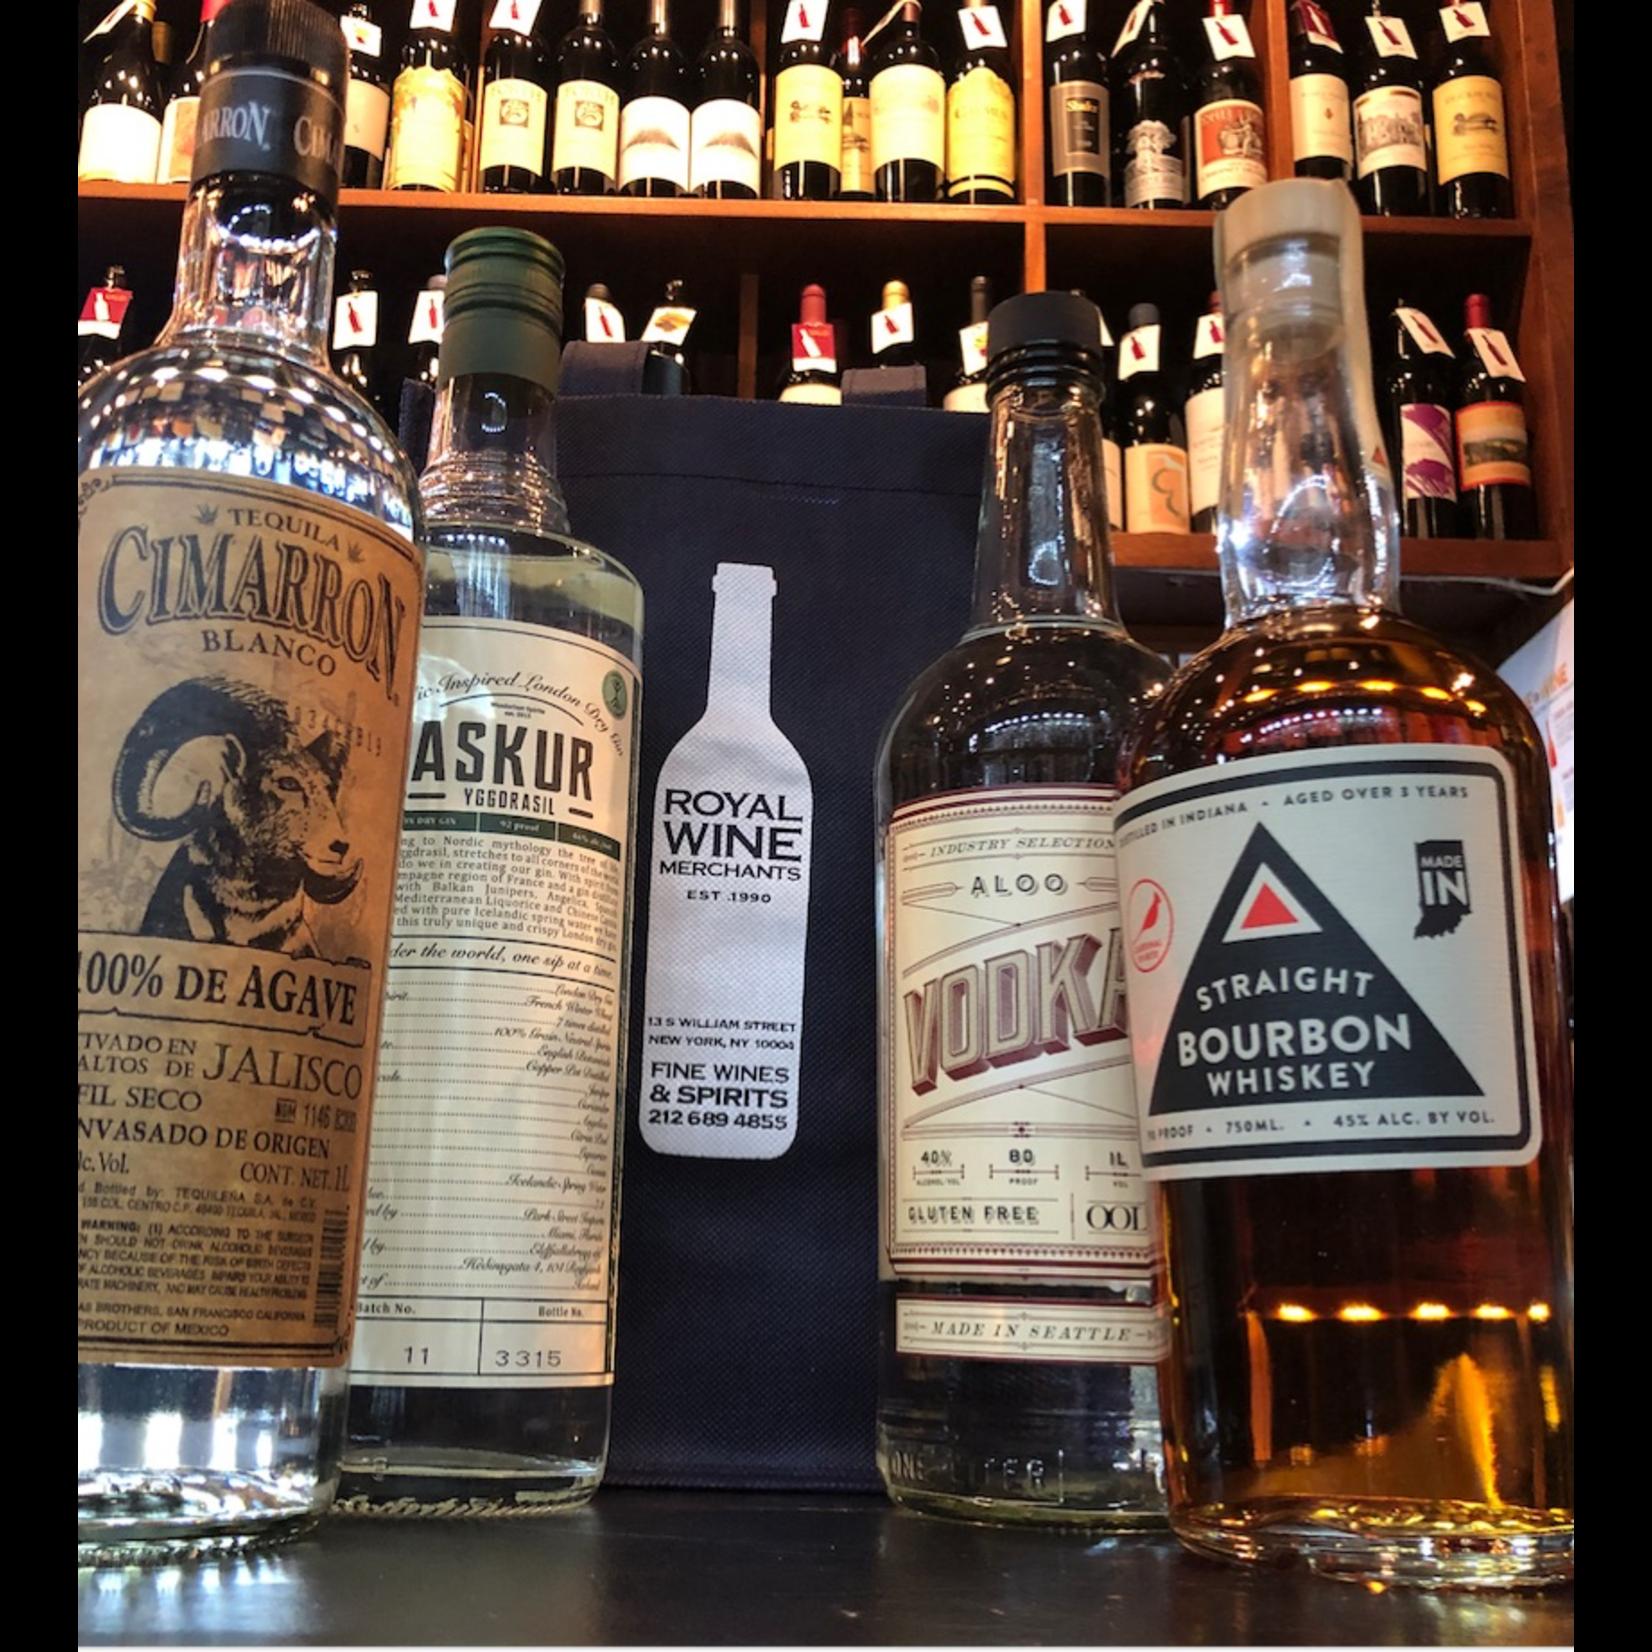 Spirits Bar Stocker Care Package one bottle each Vodka 1L, Gin 1L, Bourbon 1L, Tequila 1L